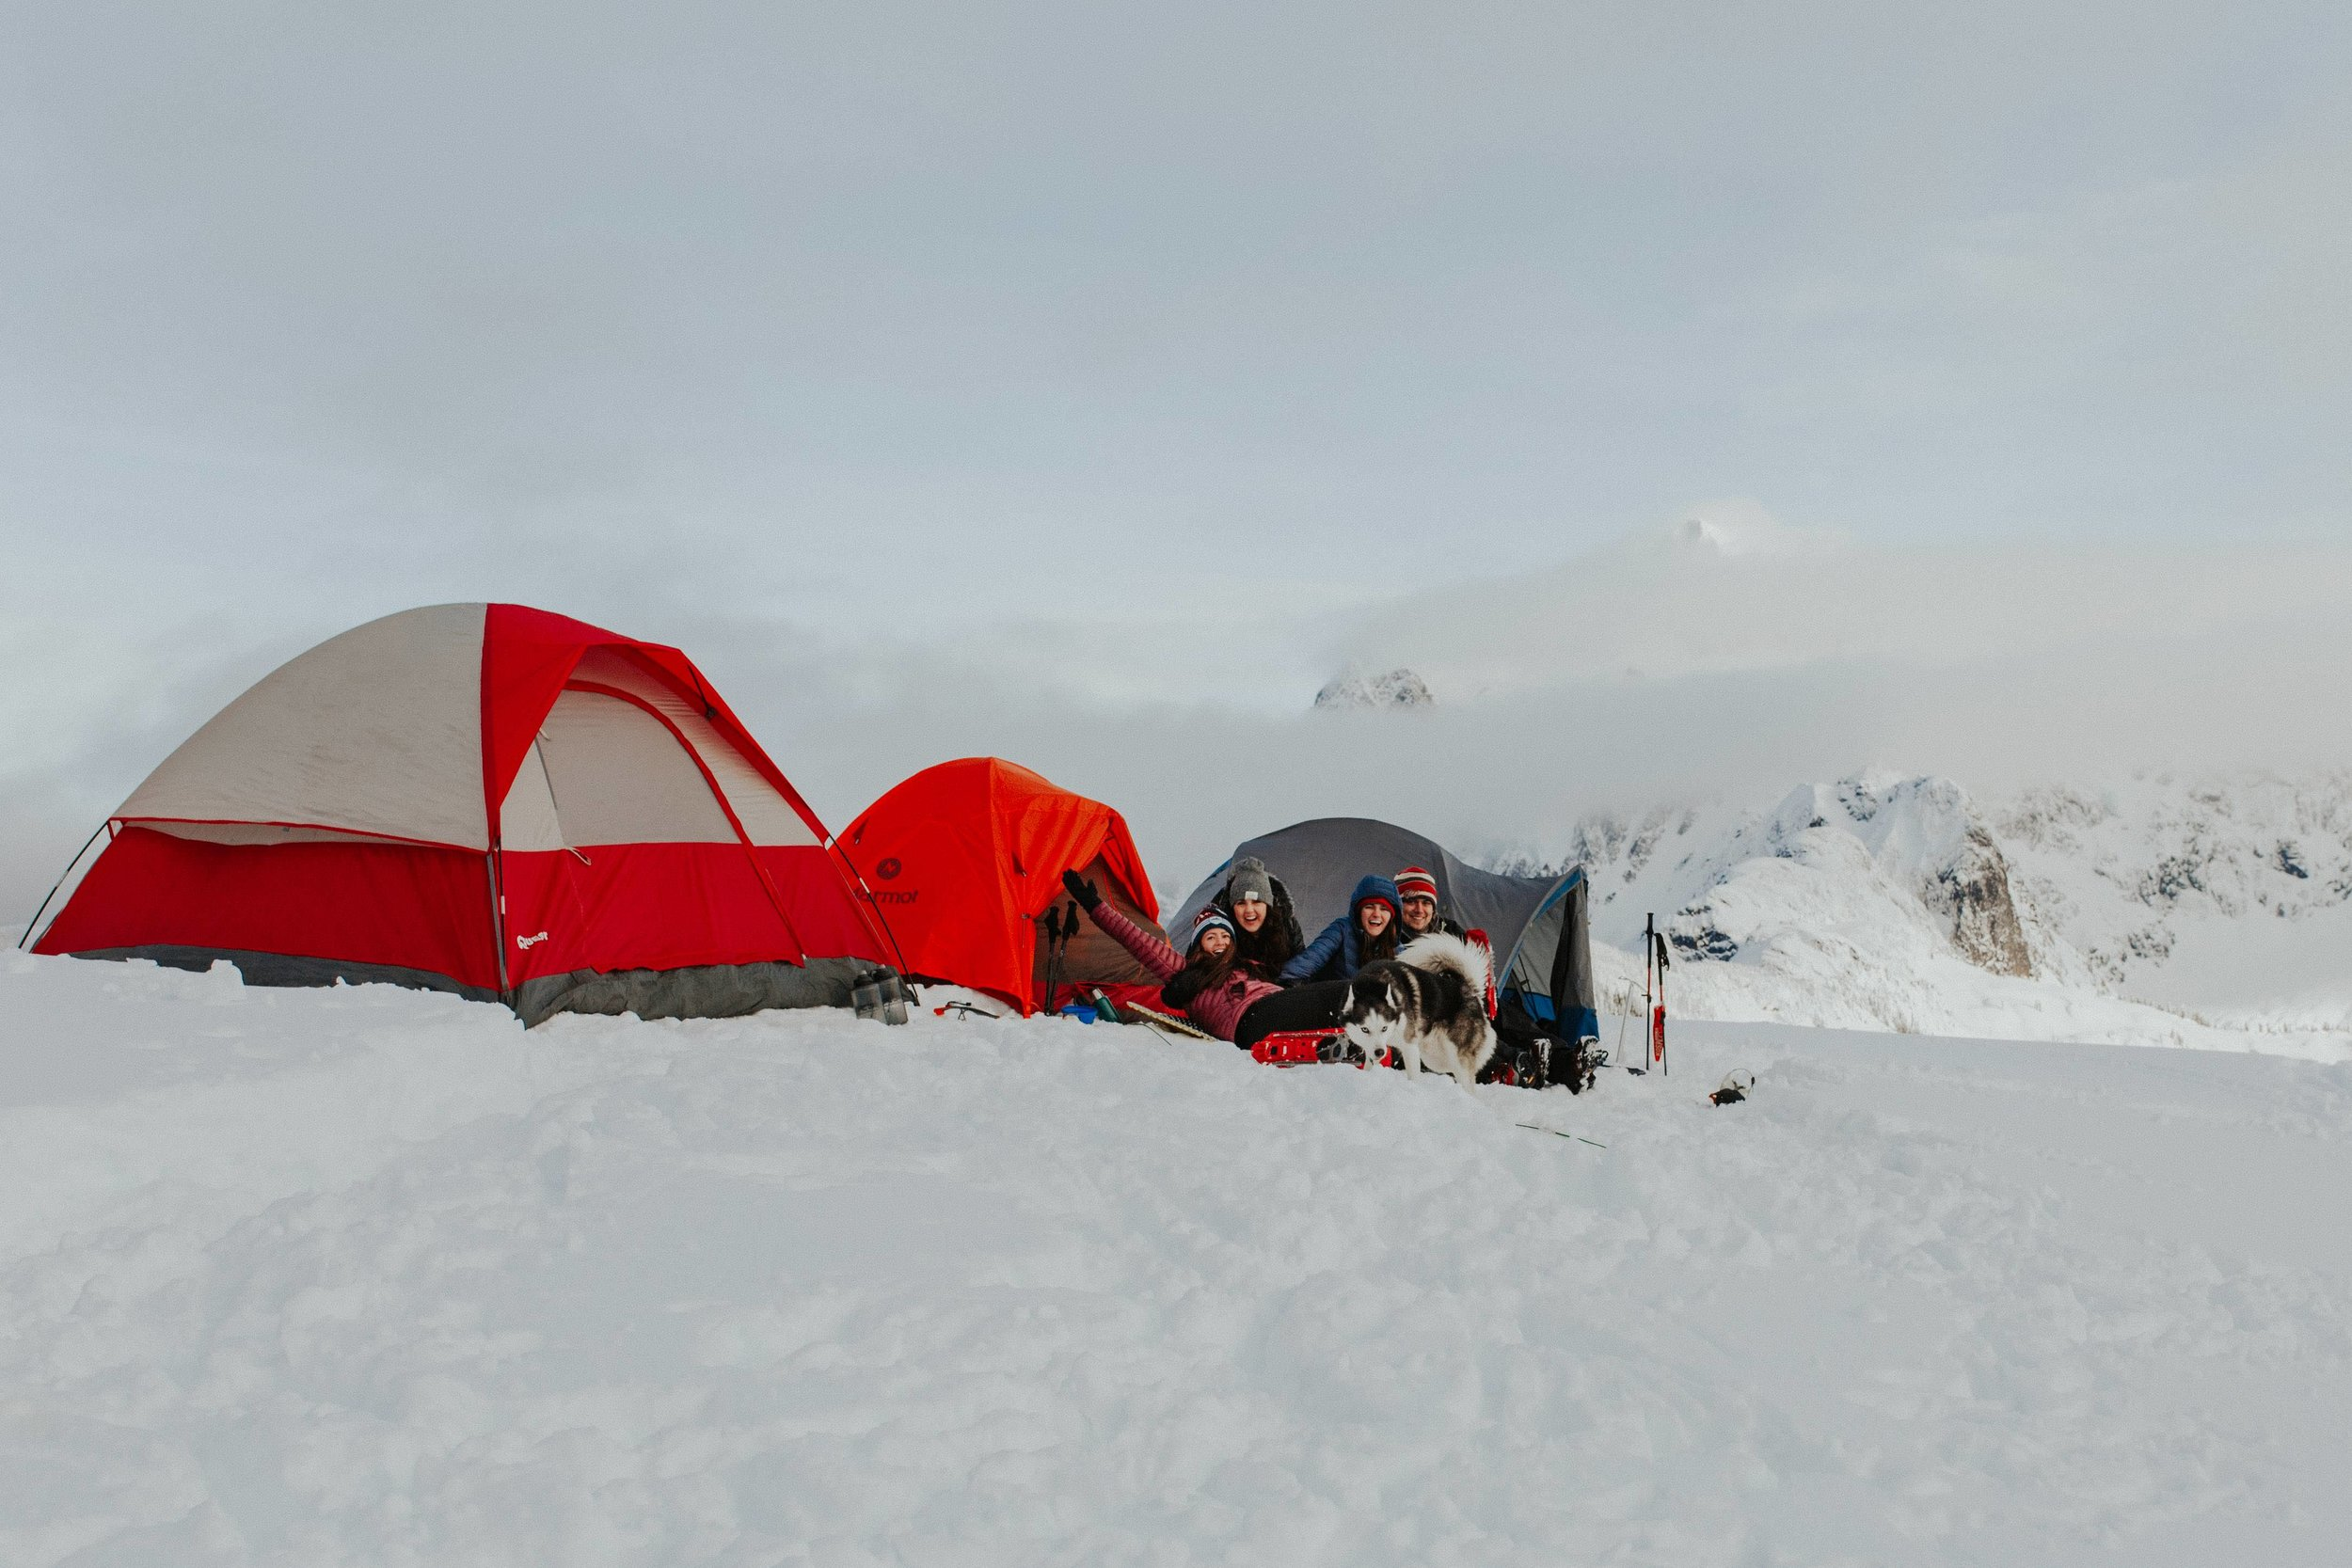 adventure-wedding-photographer-artist-point-snow-camping-elopement-photographer-mountain-crew.jpg